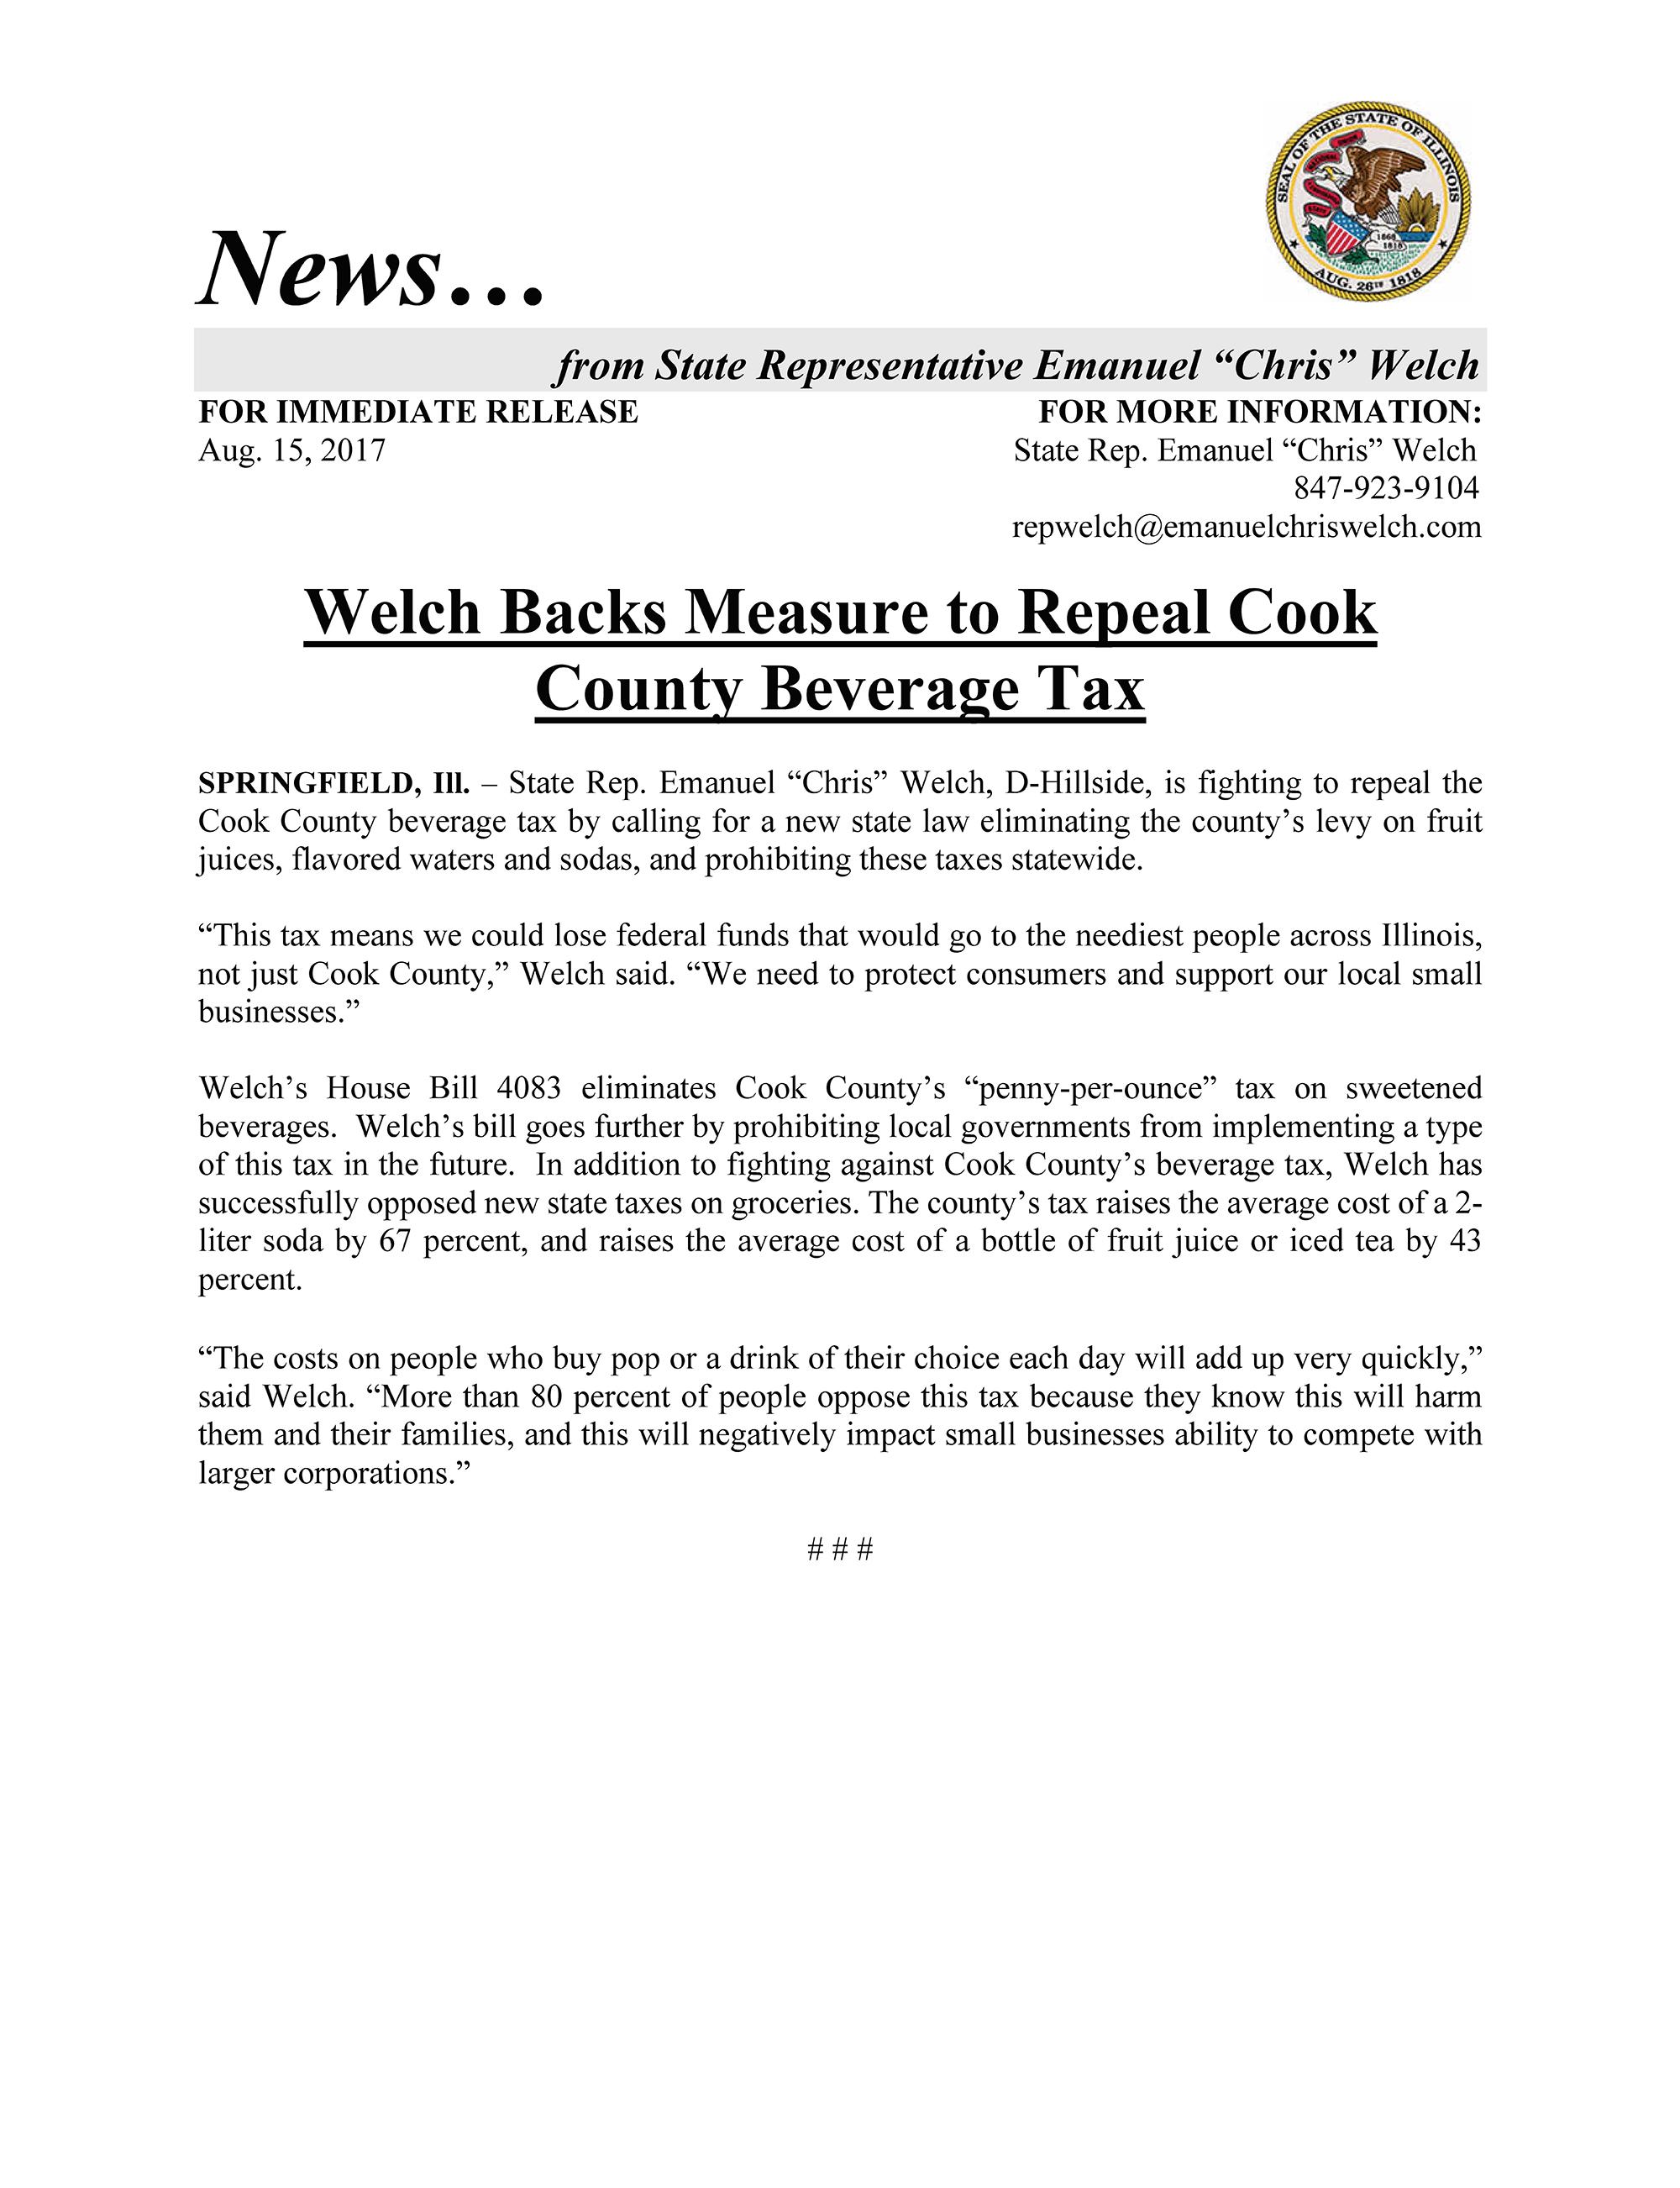 Welch Bill Demands Fiscal Accountability  (August 15, 2017)